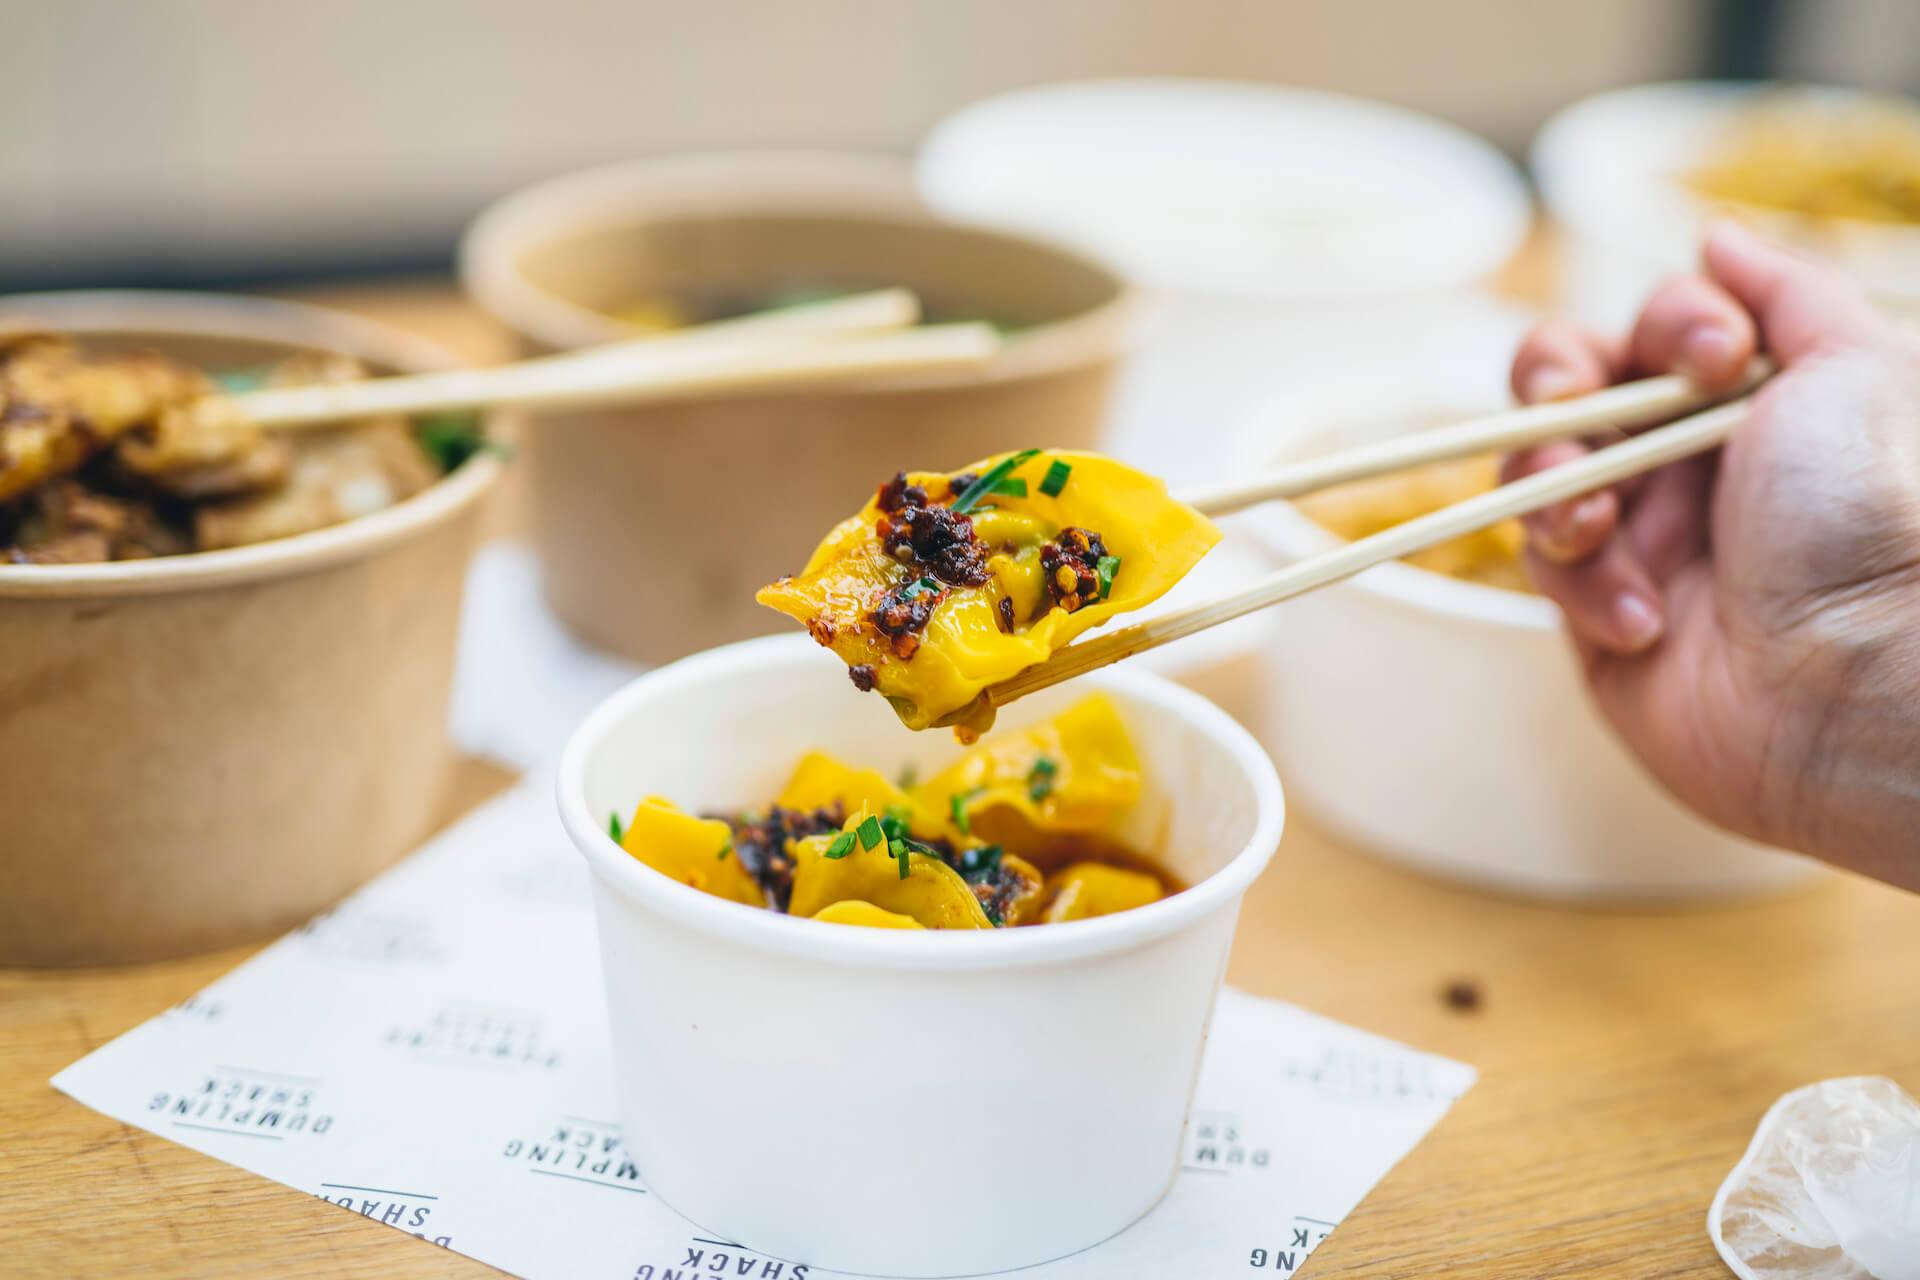 prawn-wontons-chilli-oil-dumpling-shack-london.jpg